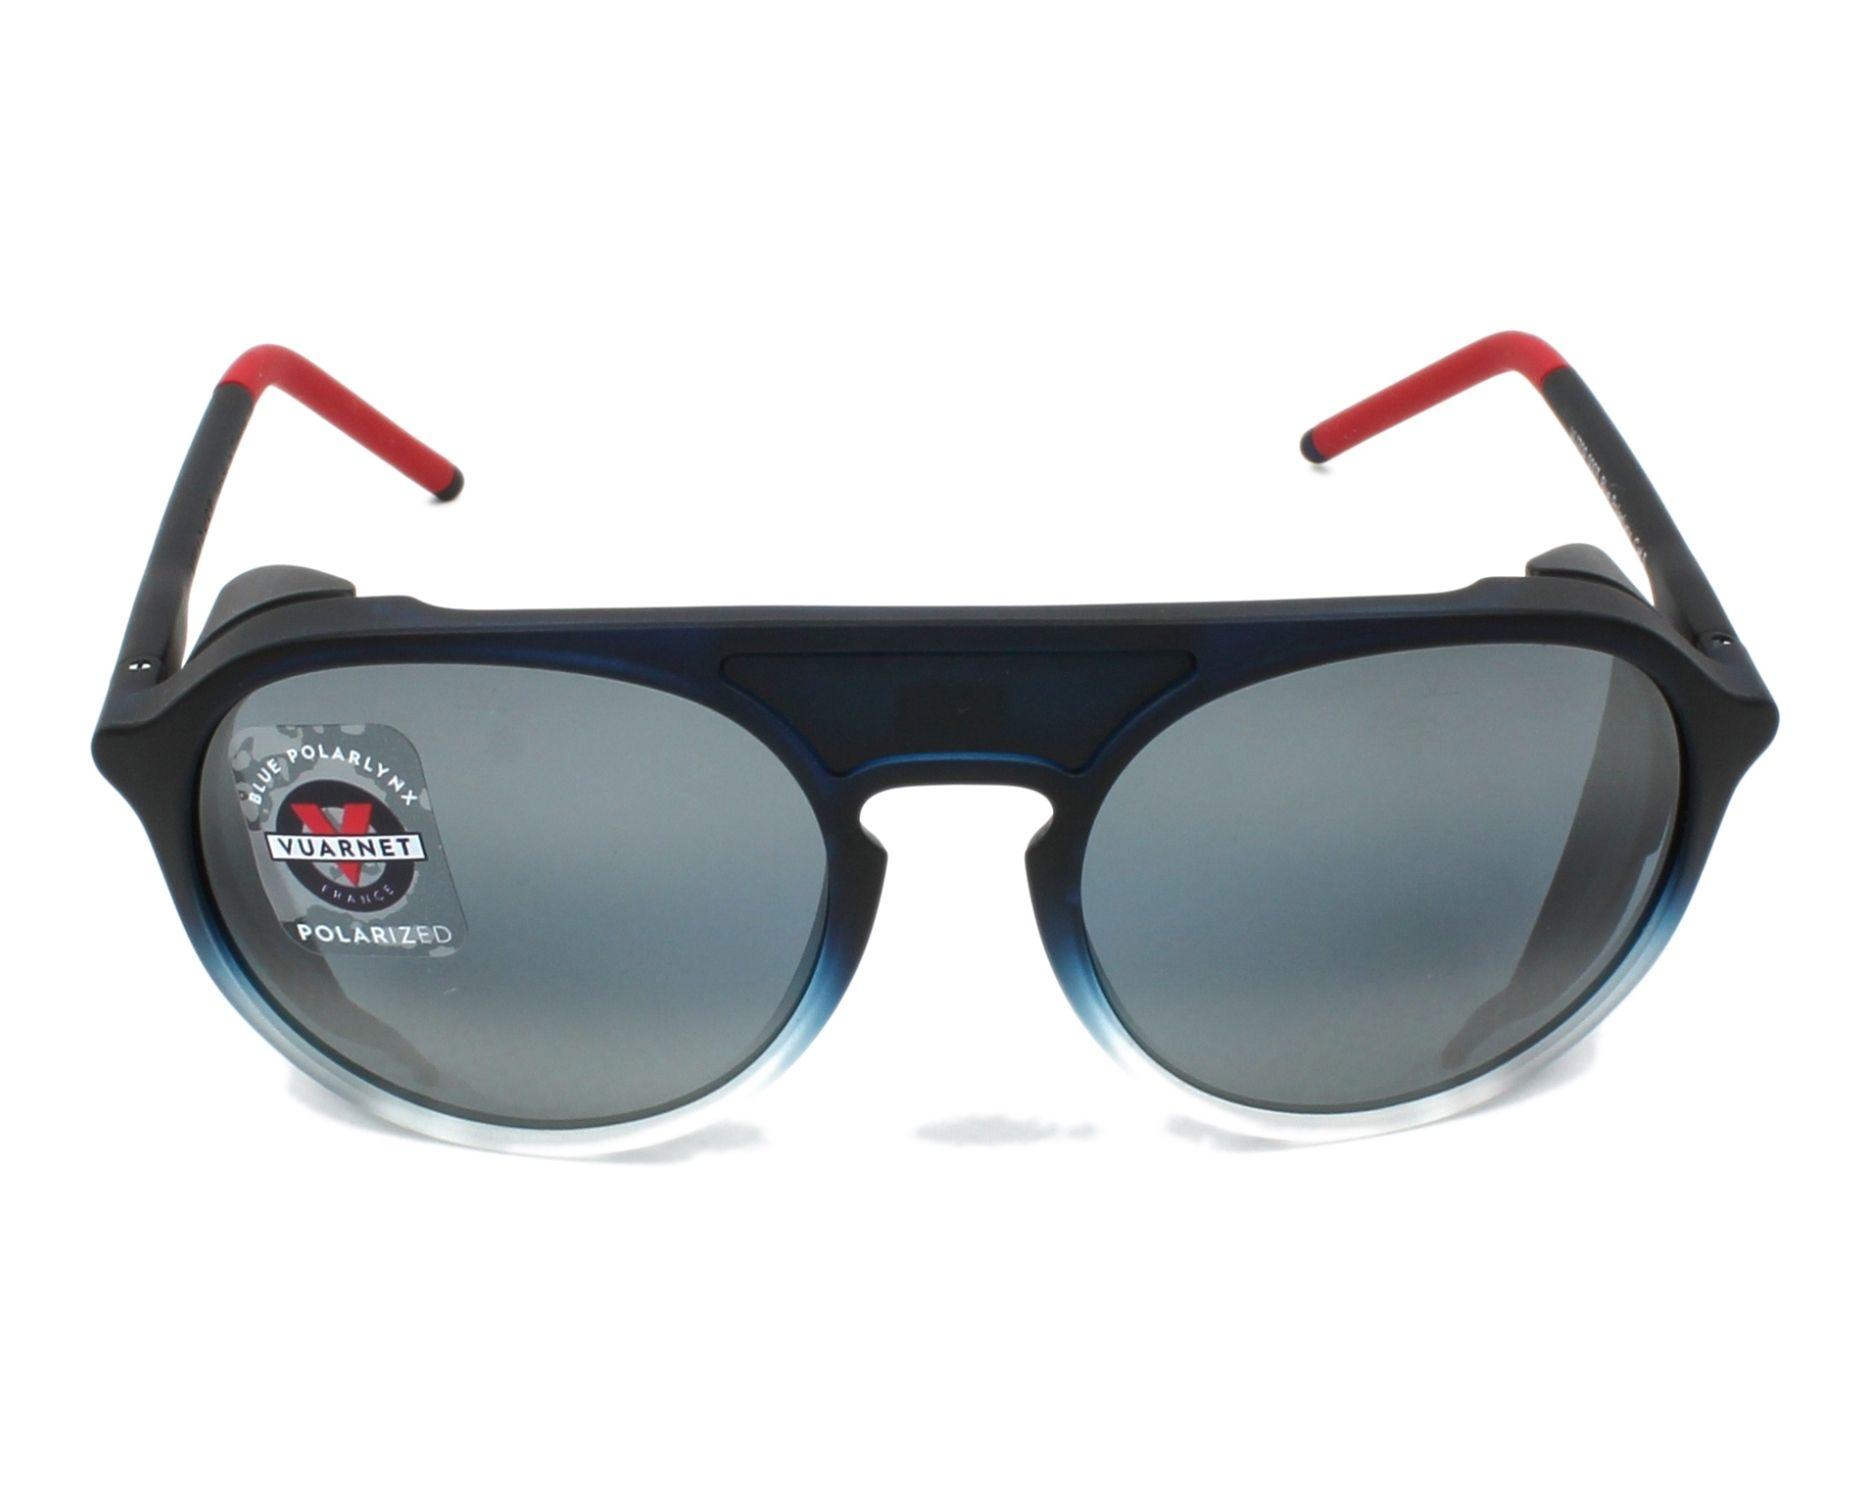 e65bd451b1cbf Sunglasses Vuarnet VL-1709 0003-0636 51-18 Black Crystal front view